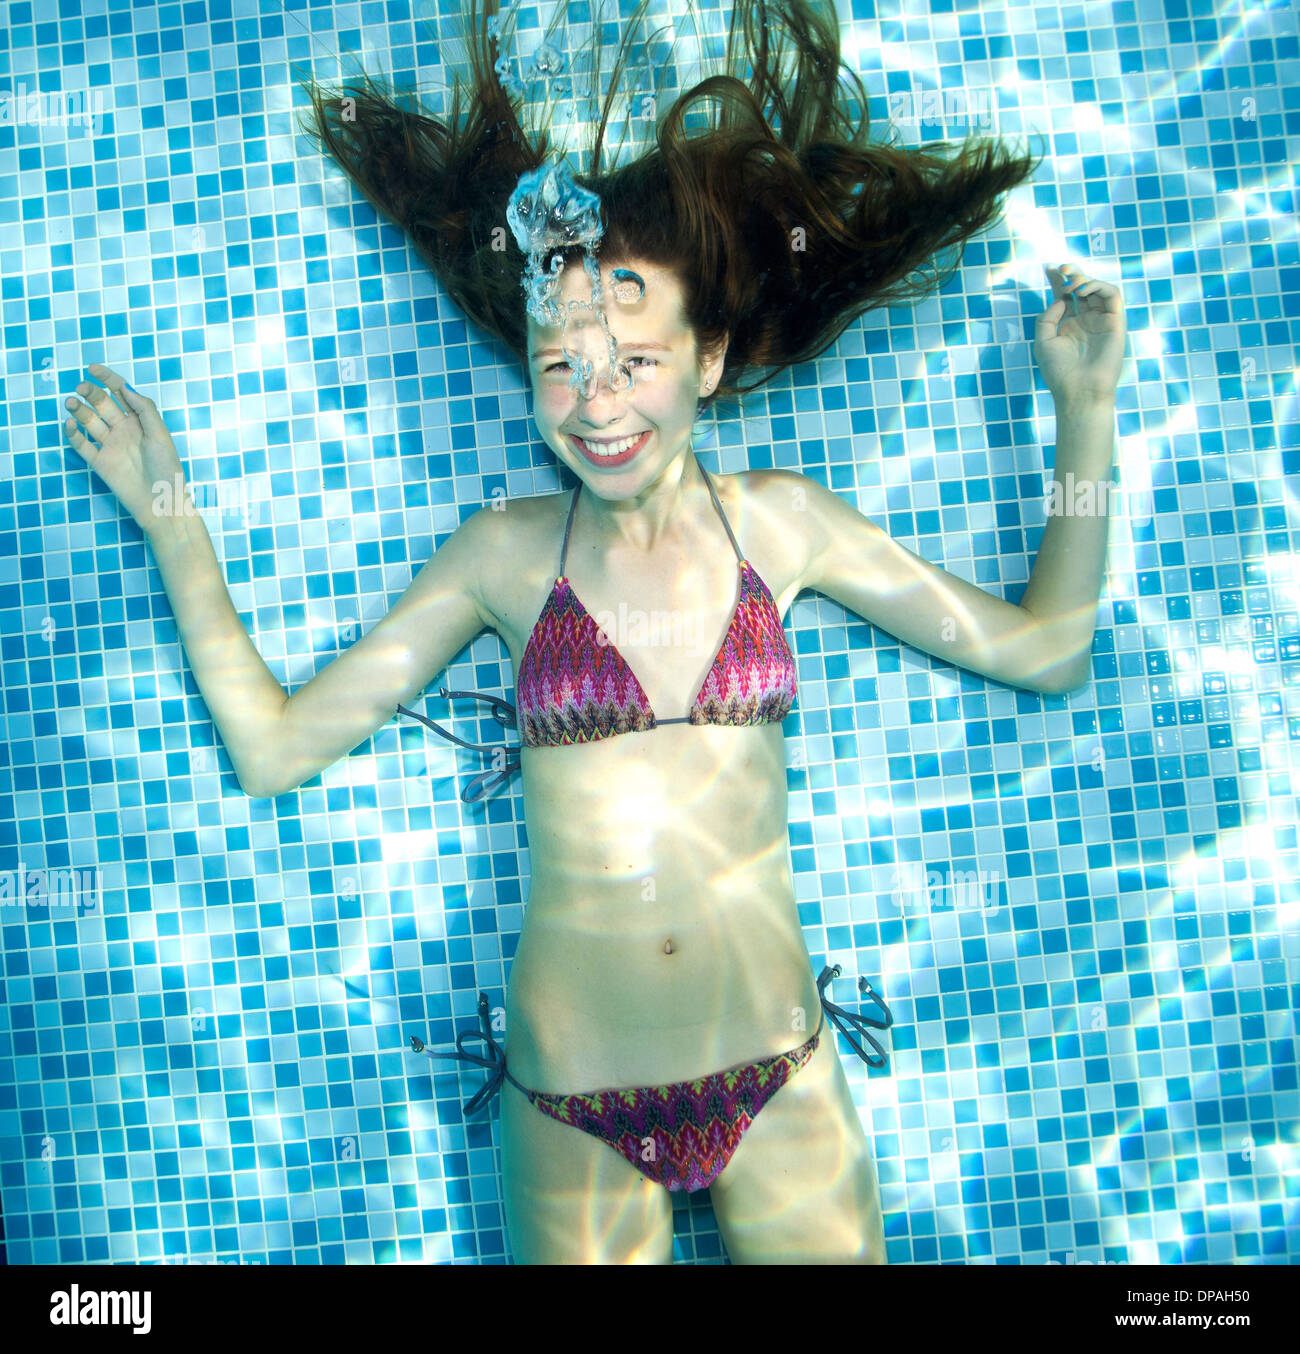 Girl underwater in swimming pool - Stock Image